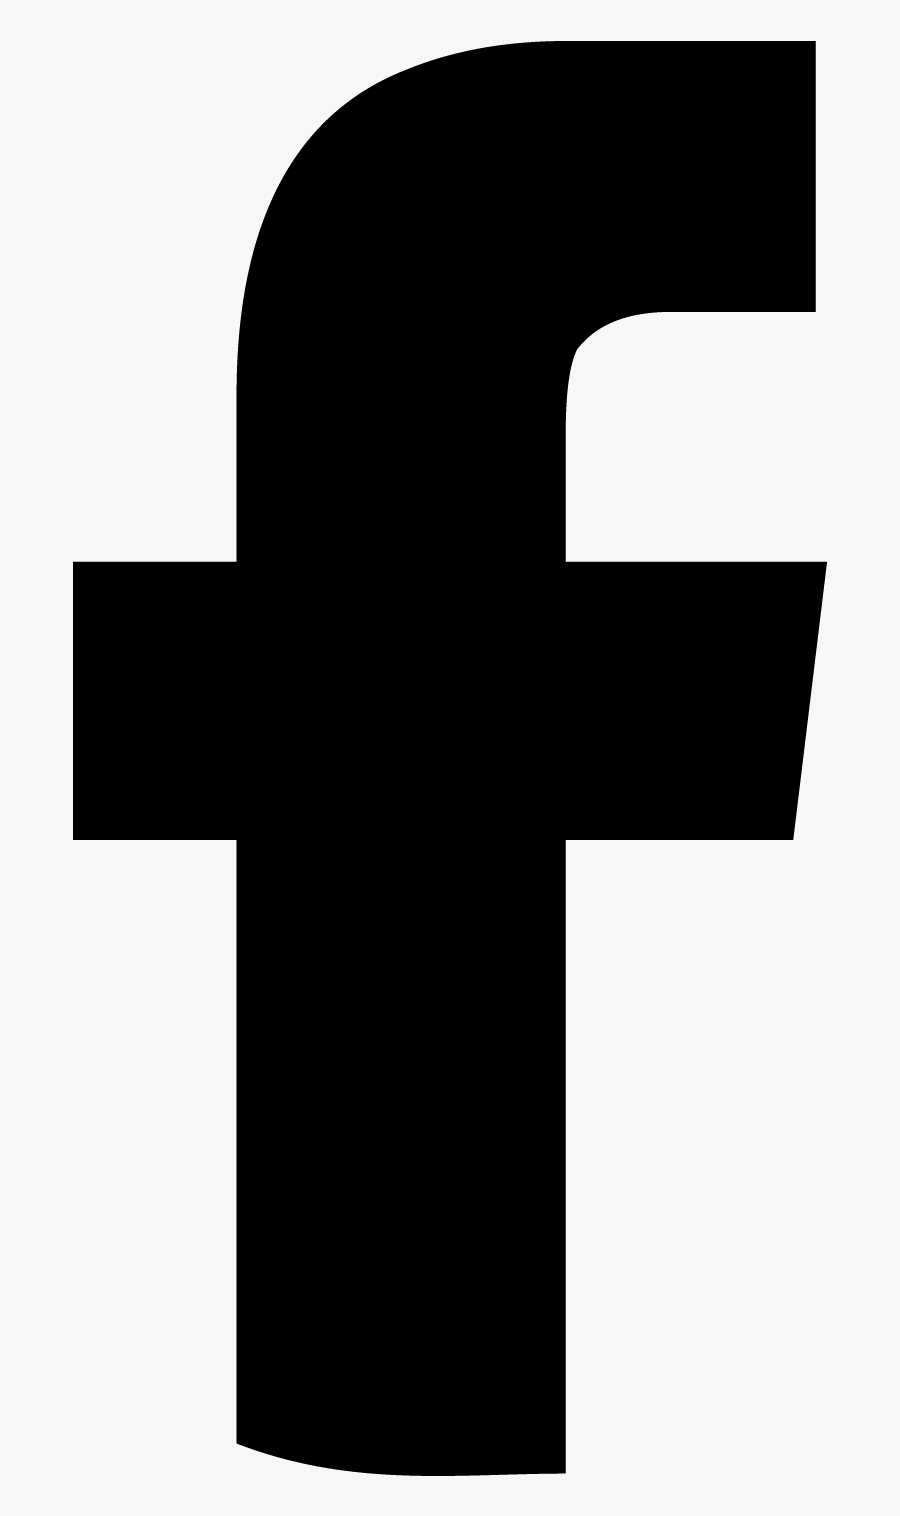 Icon Fb Png : Facebook, Black, Vector, Blanco, Transparent, Clipart, ClipartKey